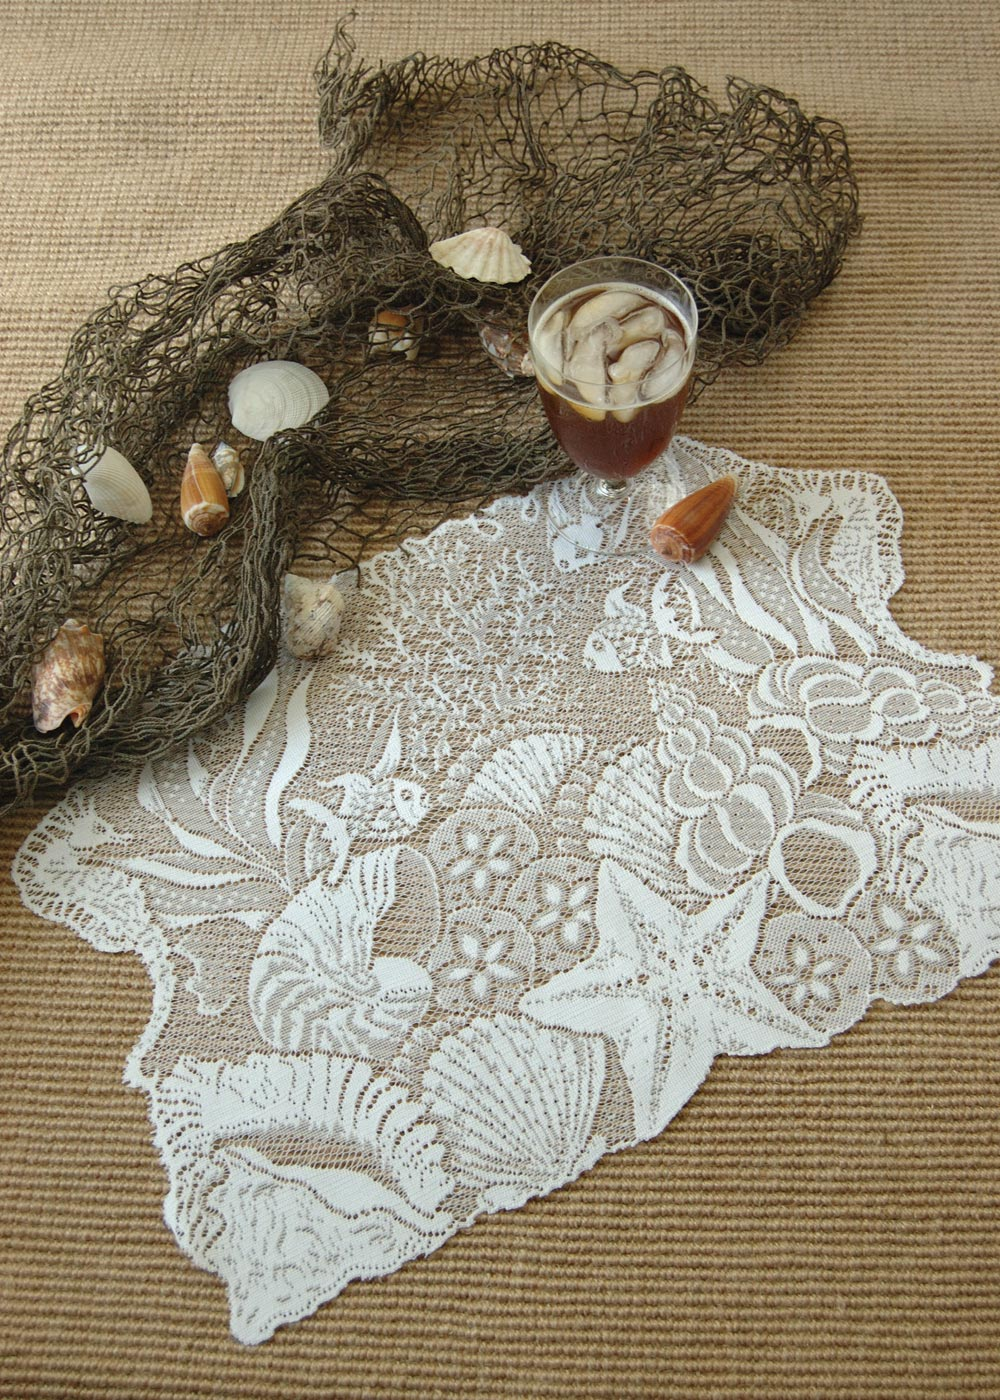 Seascape Placemat Heritage Lace